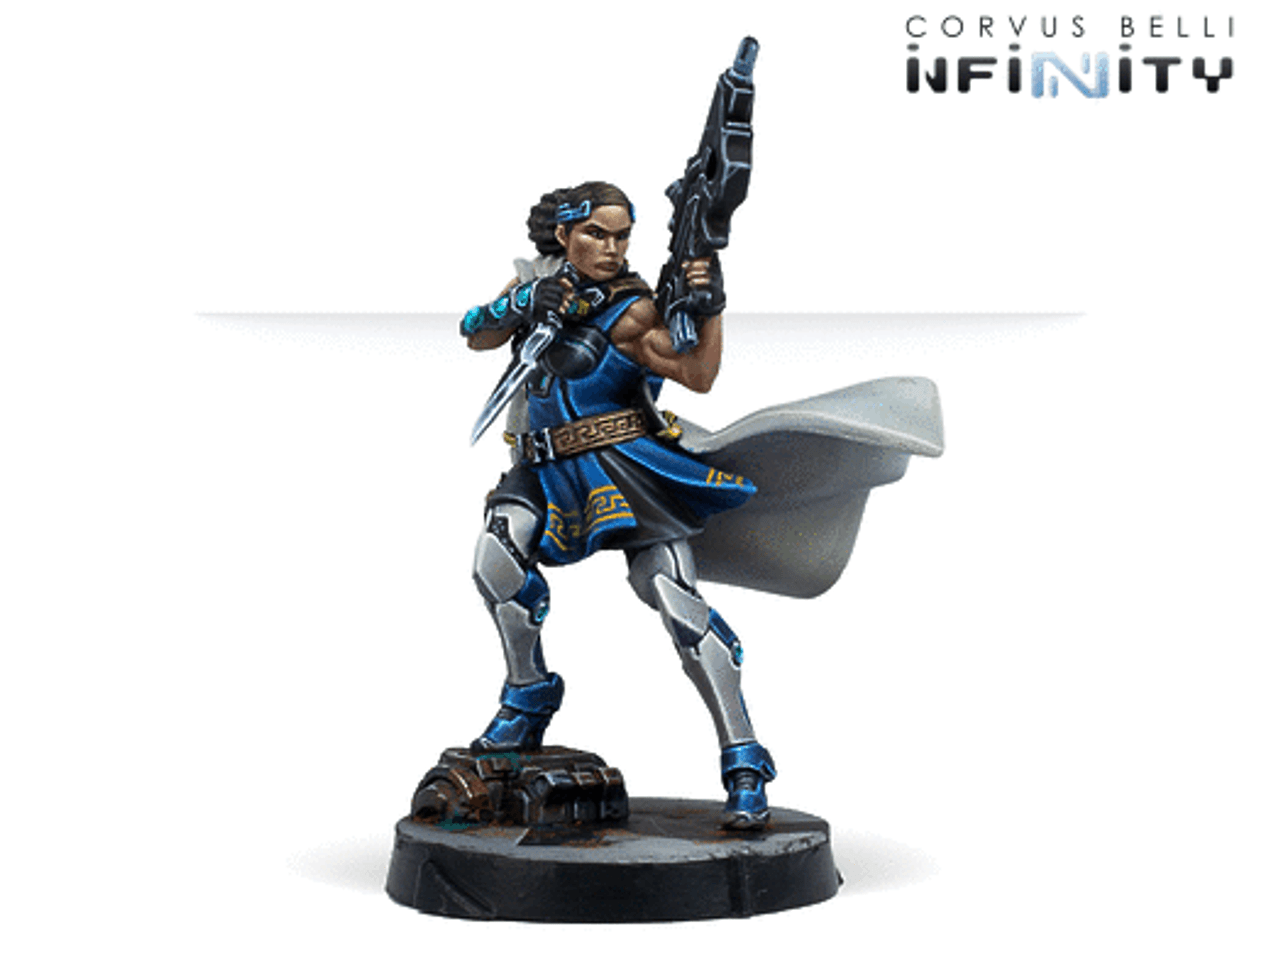 Infinity CodeOne O-12 Booster Pack Beta